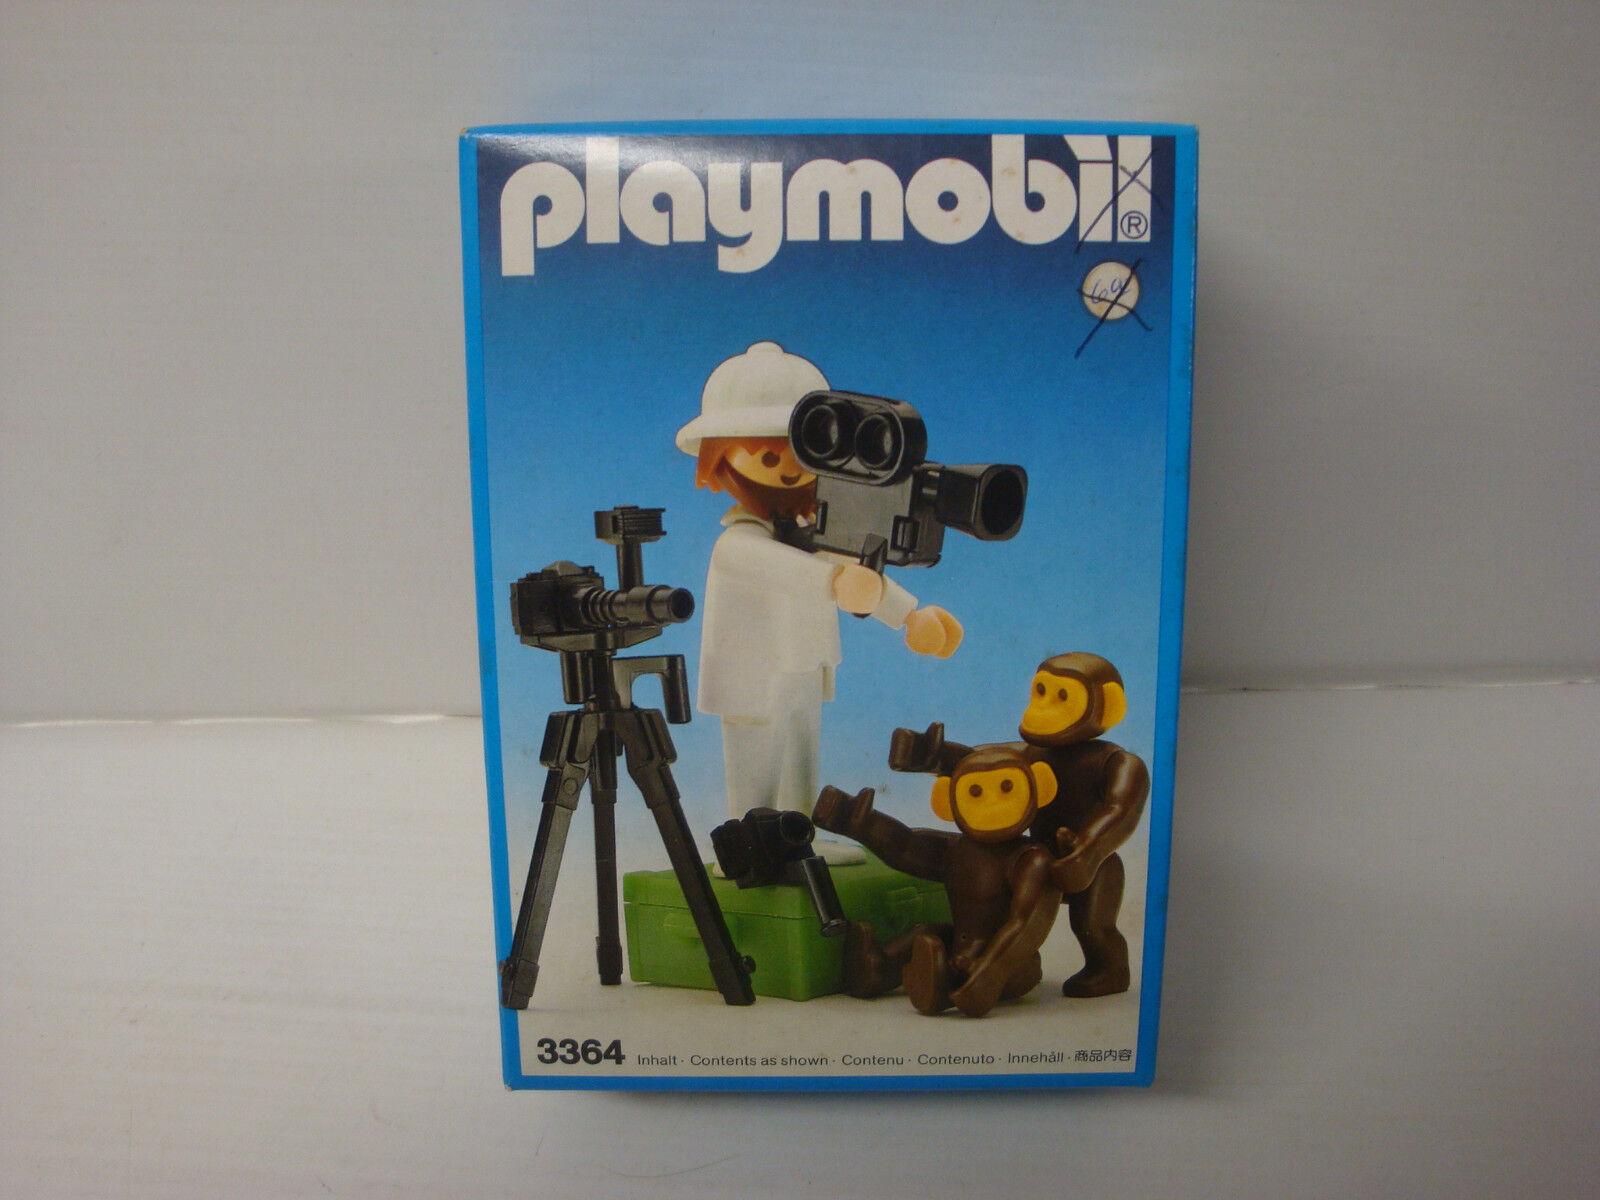 Playmobil ancien état neuf en boite scellée - photographe safari 3364 - n°1